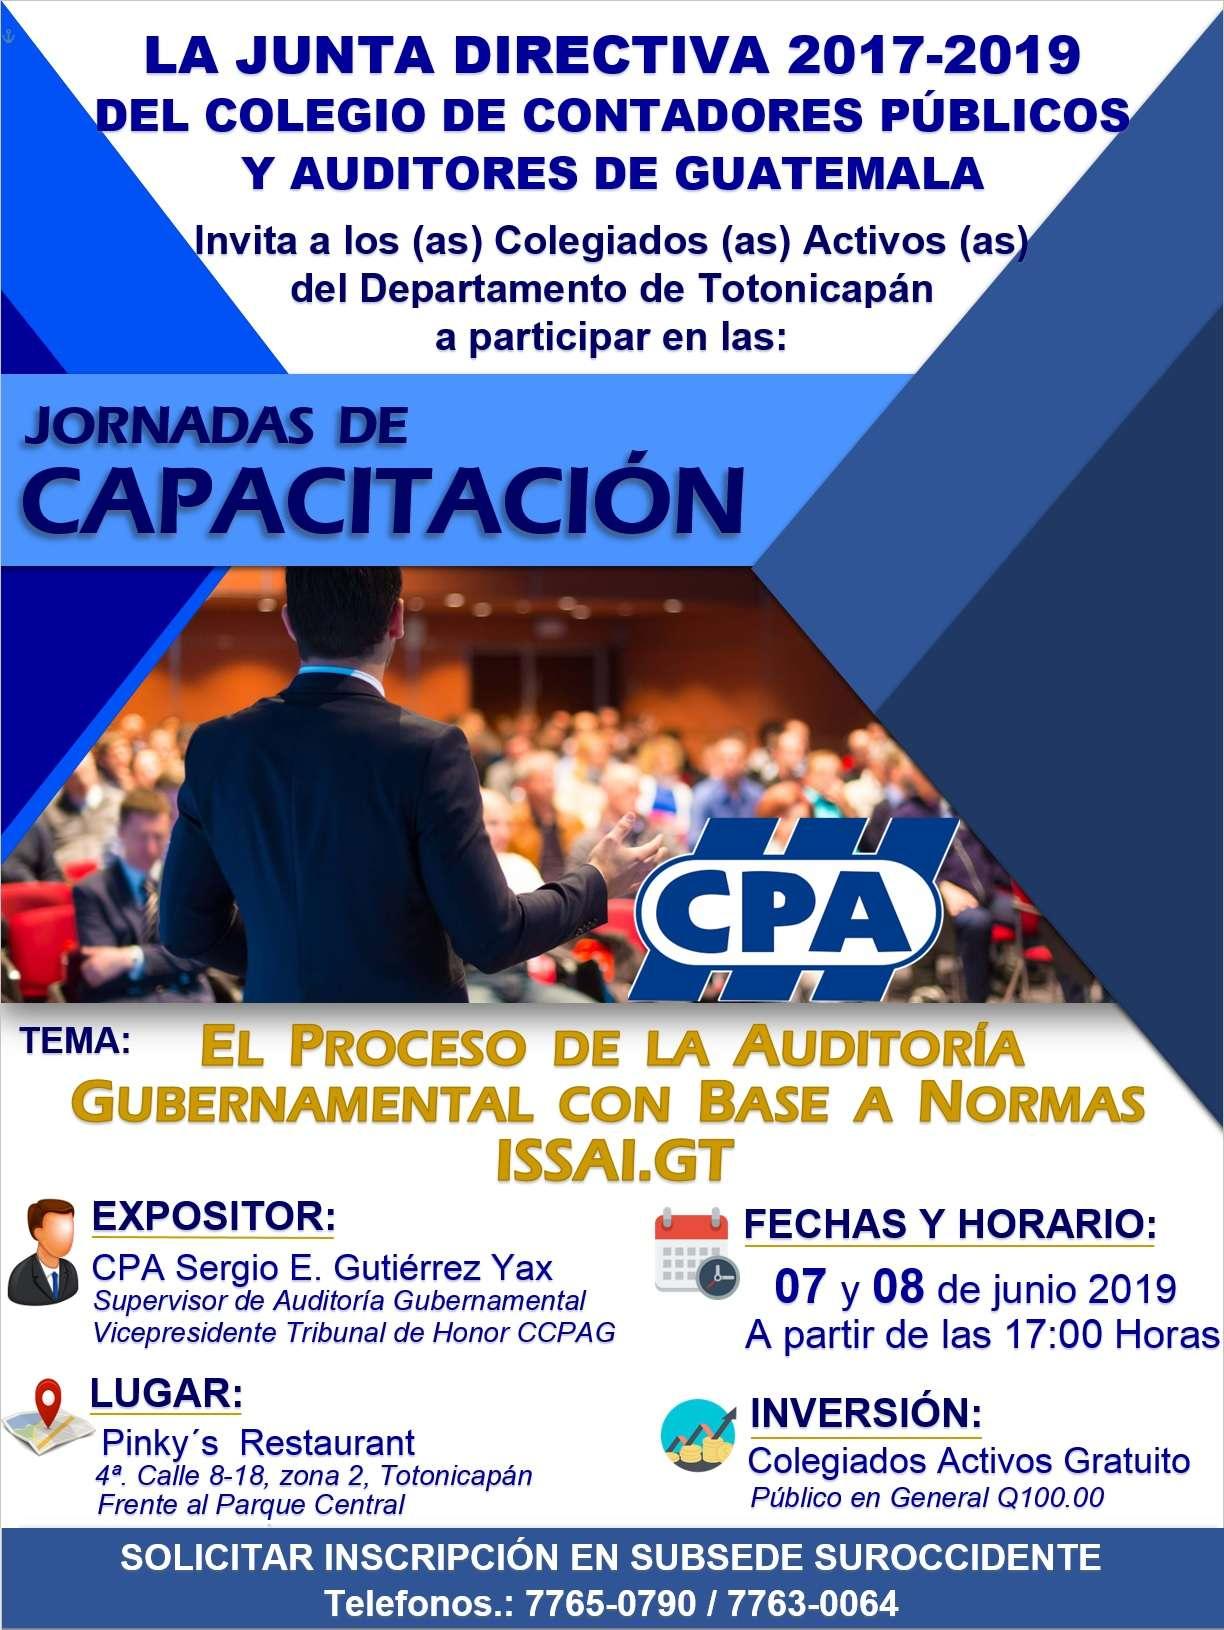 Jornadas de Capacitación: Departamento de Totonicapán